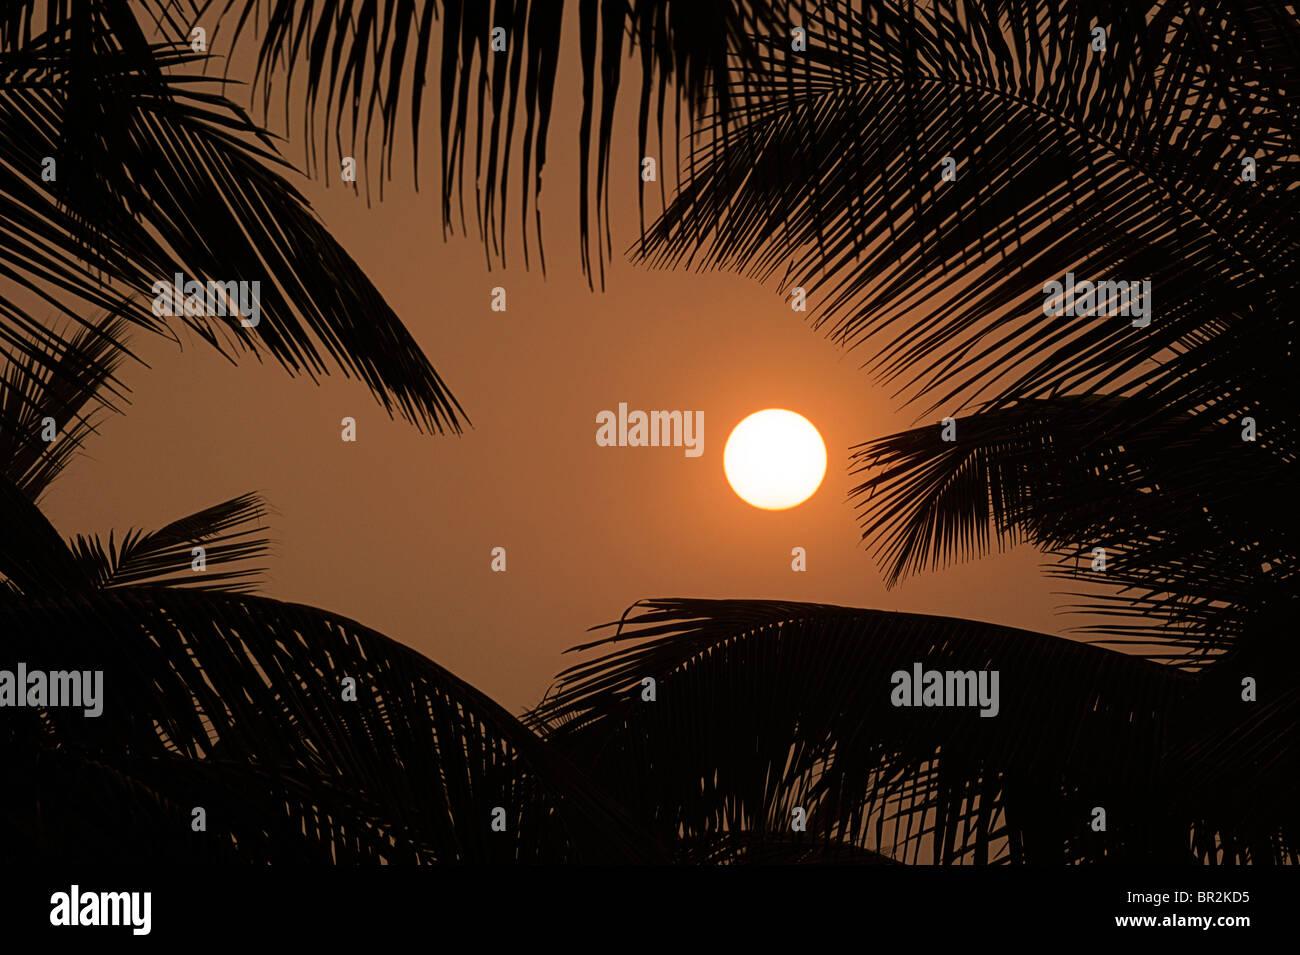 Sonne, goldenen Himmel und Silhouette Palmen. Indische Sonnenuntergang Stockbild